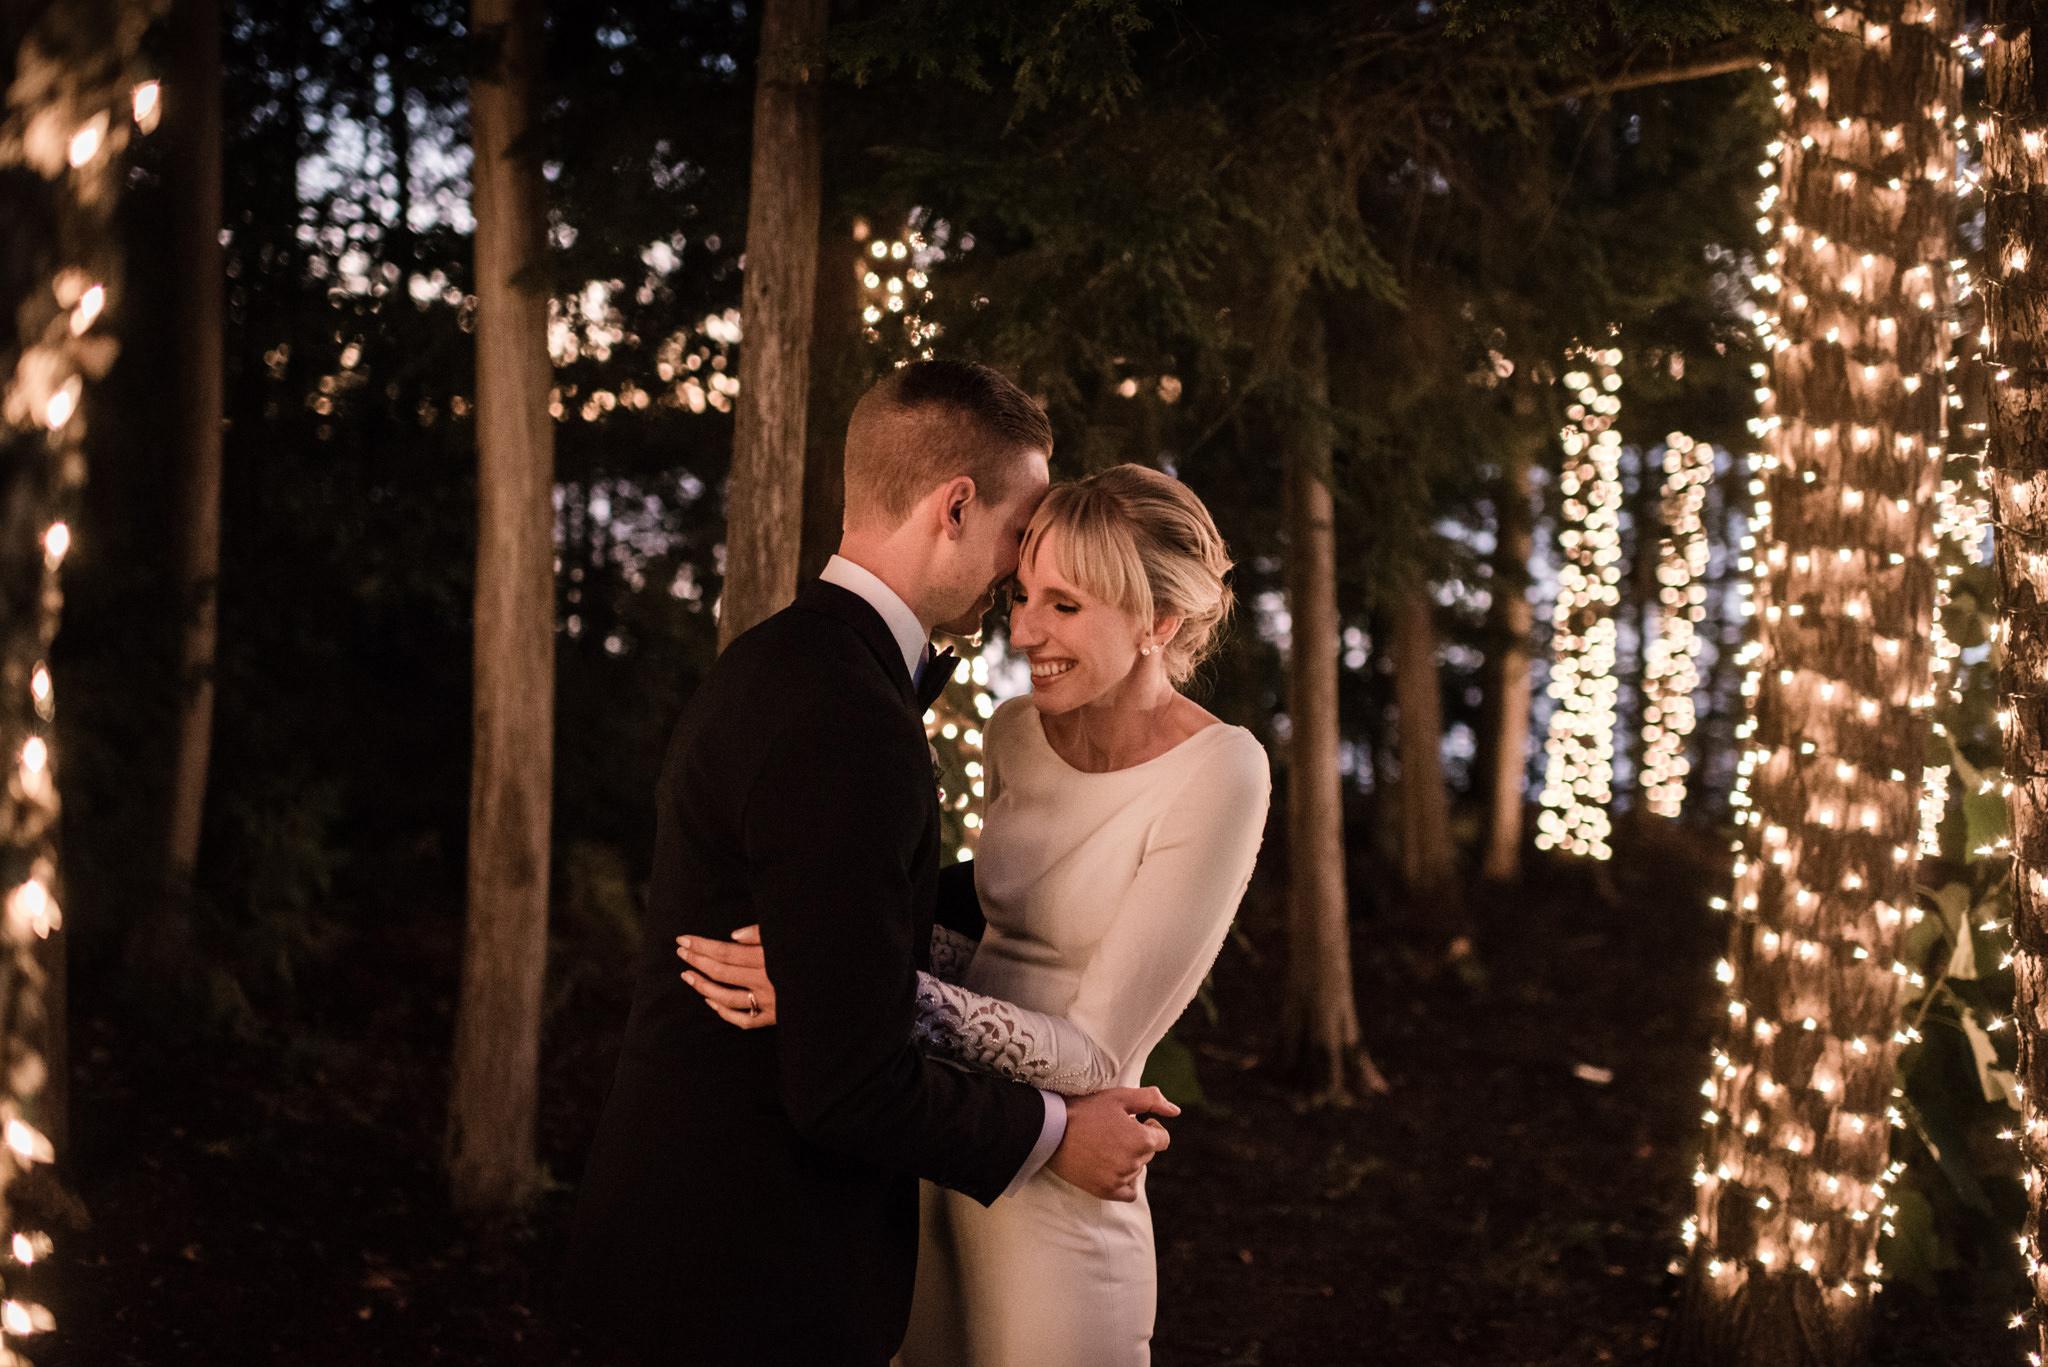 010-string-lights-romantic-wedding-photography-toronto-ontario.jpg